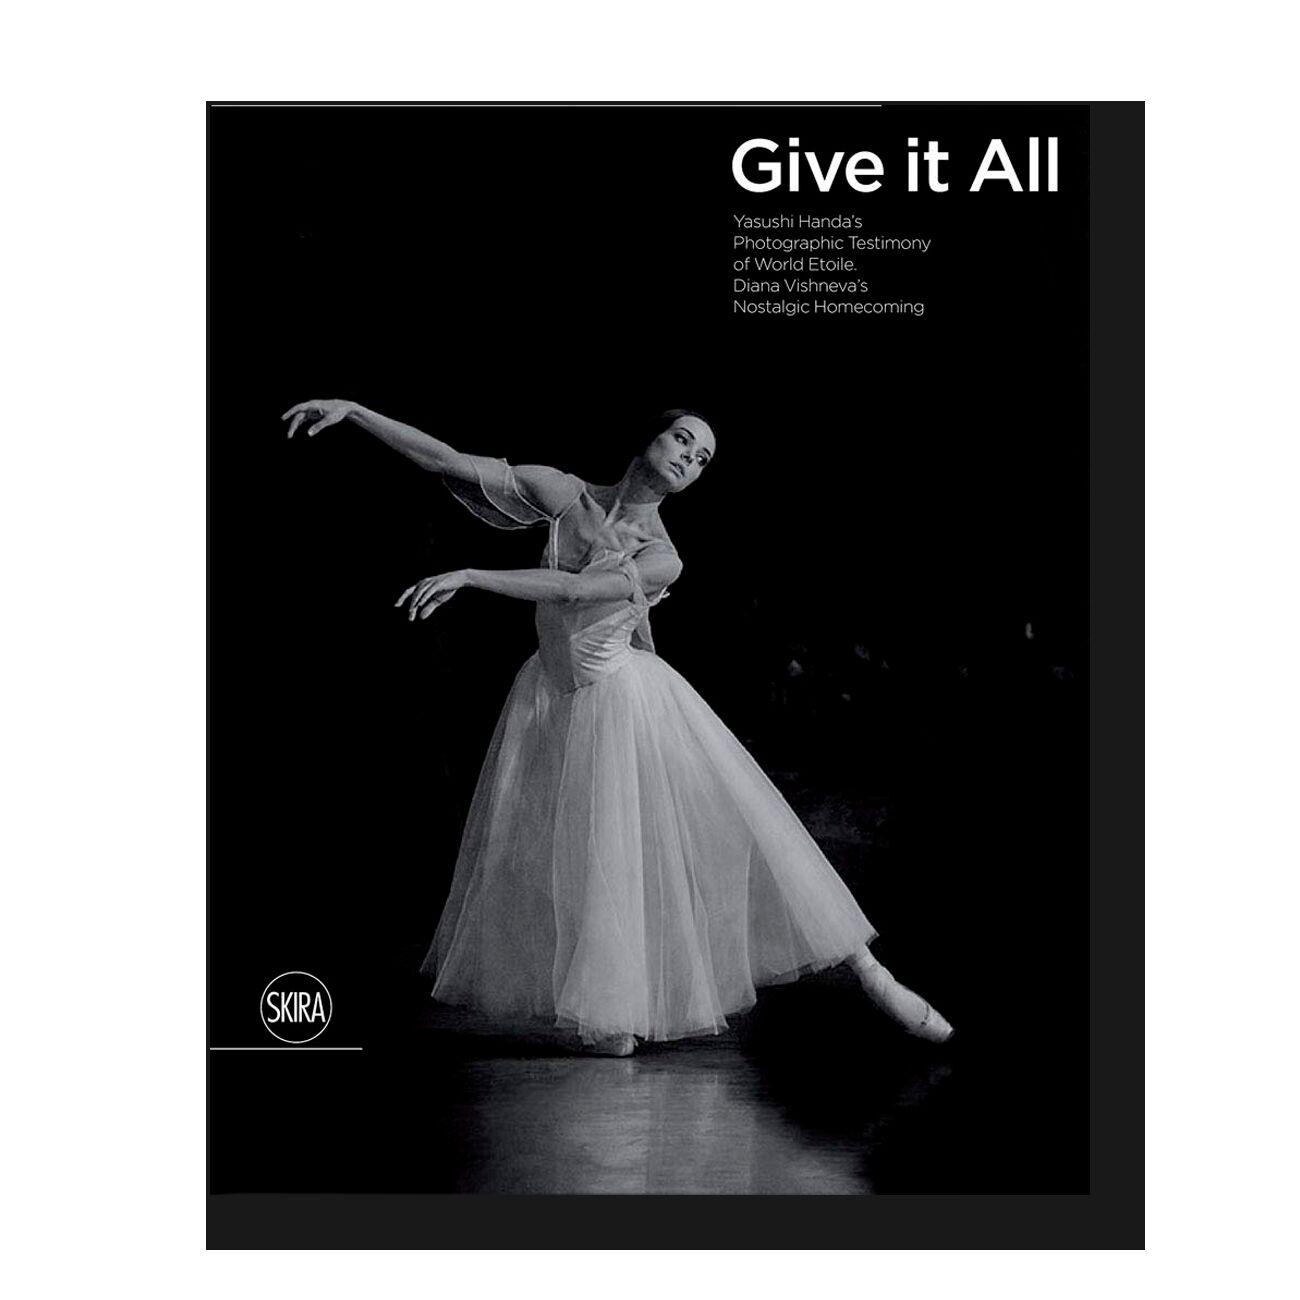 Give It Your All: Etoile Diana Vishneva's